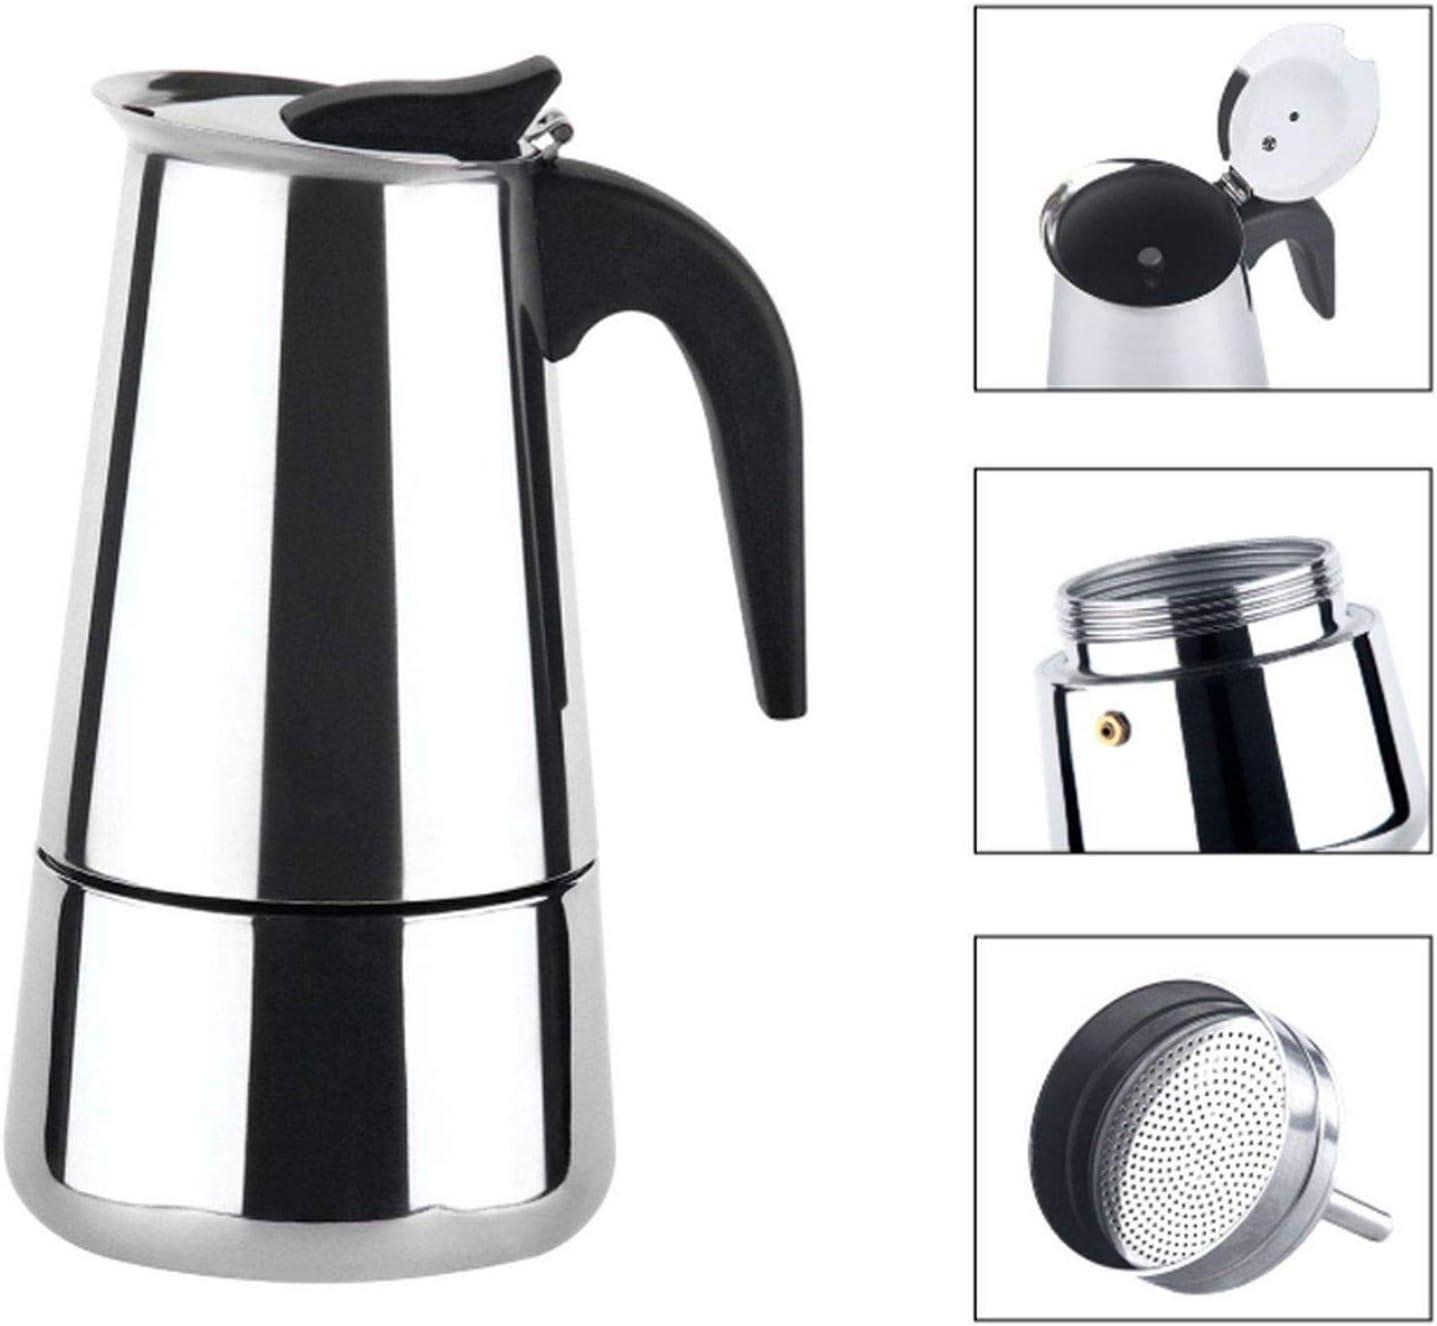 Amazon.com: Cafetera Moka Espresso Maker Mocha Maker Acero ...